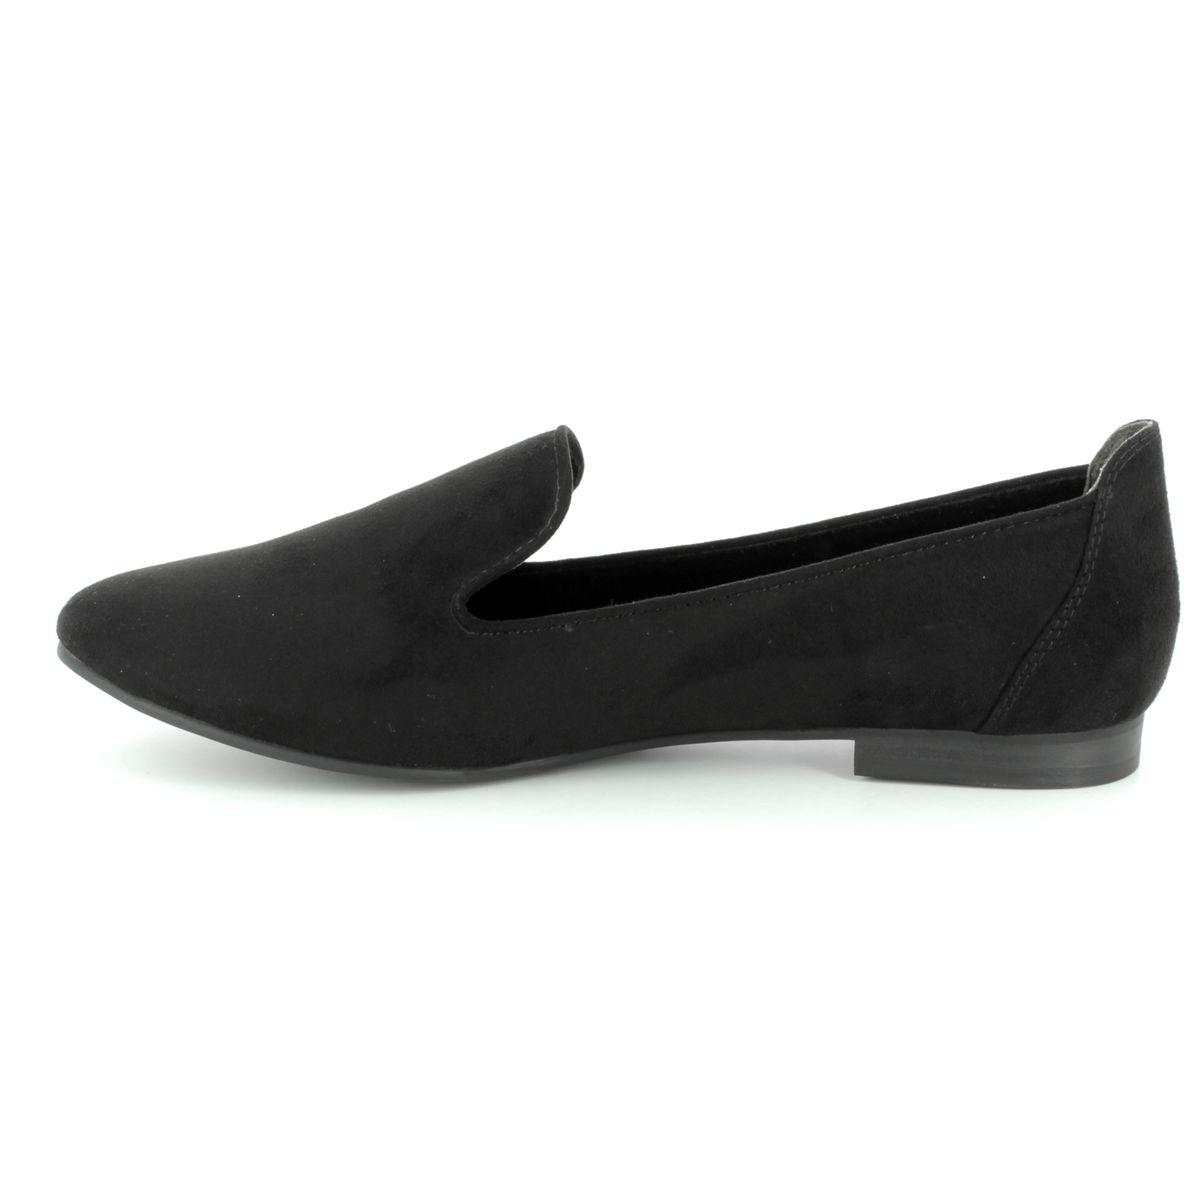 Marco Tozzi Bravi 24234-20-001 Black pumps   Begg Shoes 67eba54252